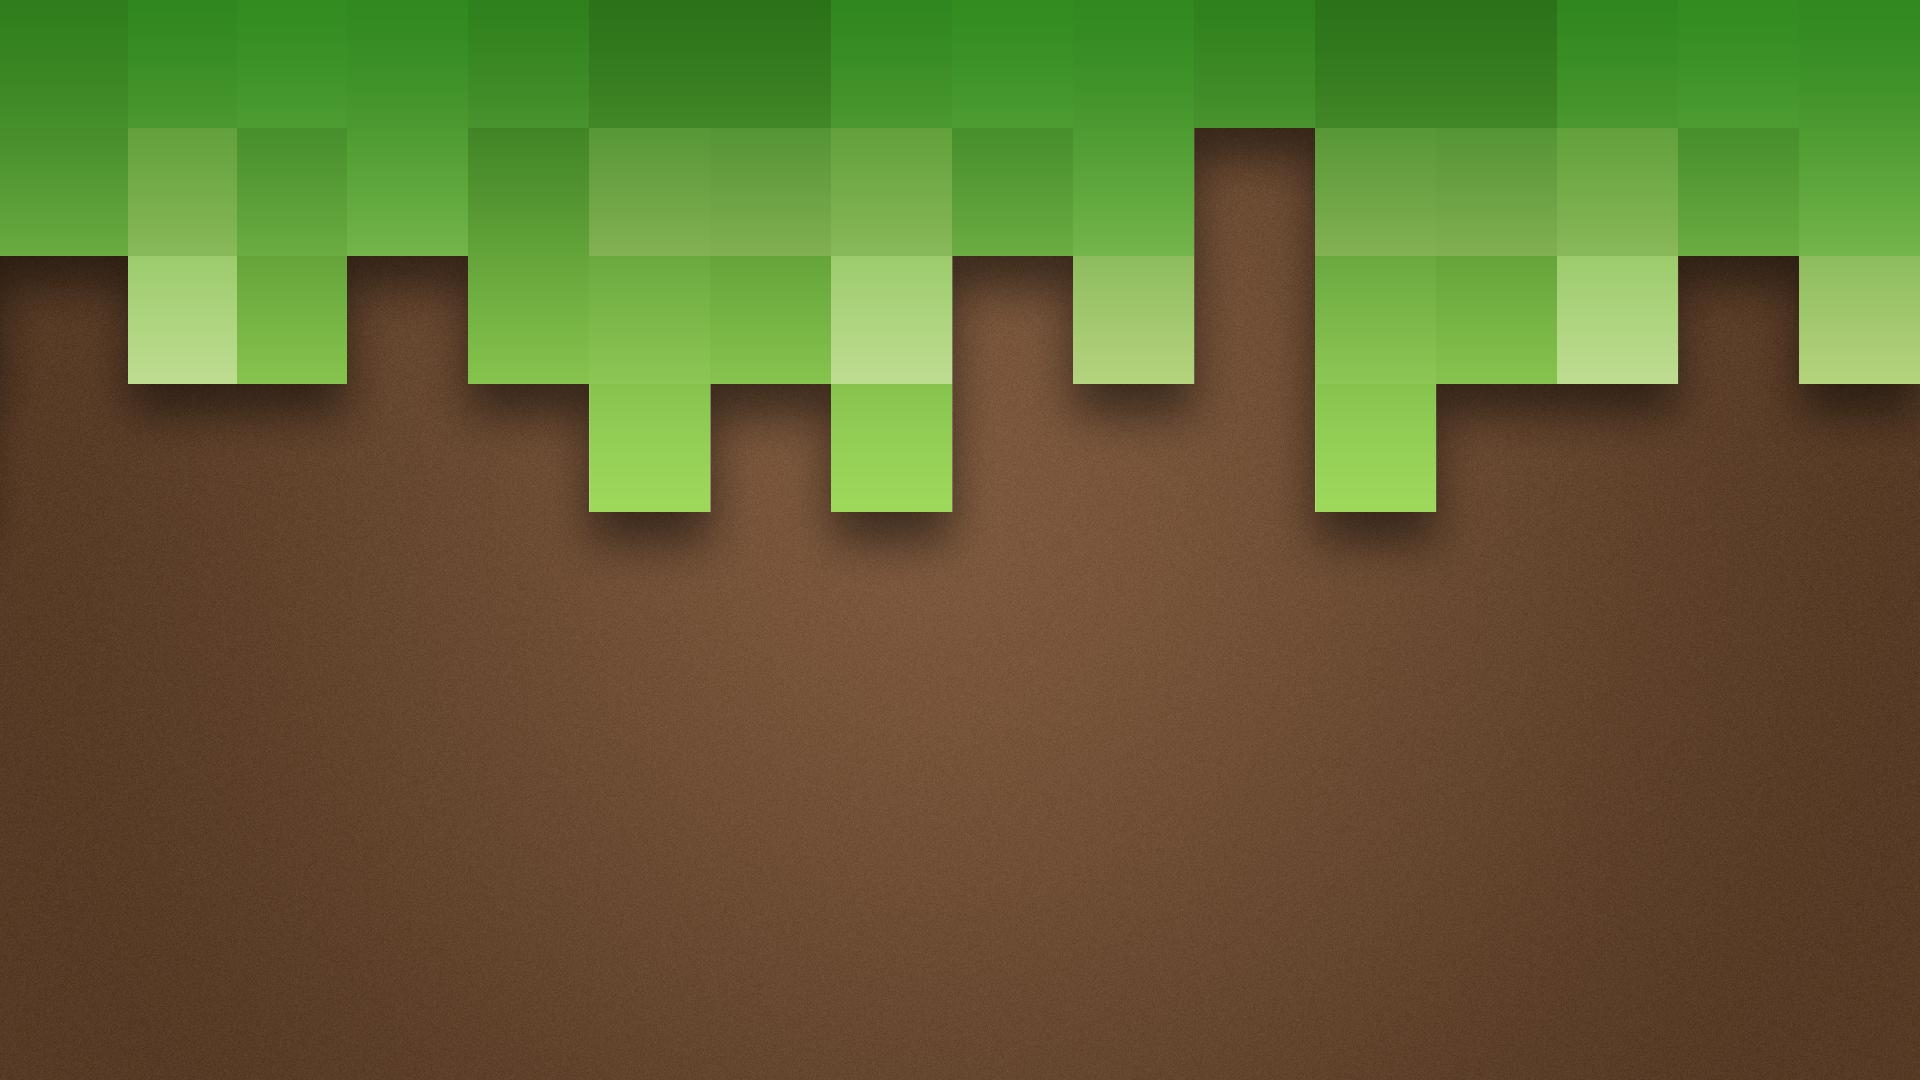 illustration grass text logo Minecraft green dirt diamonds circle brand color shape design line number screenshot